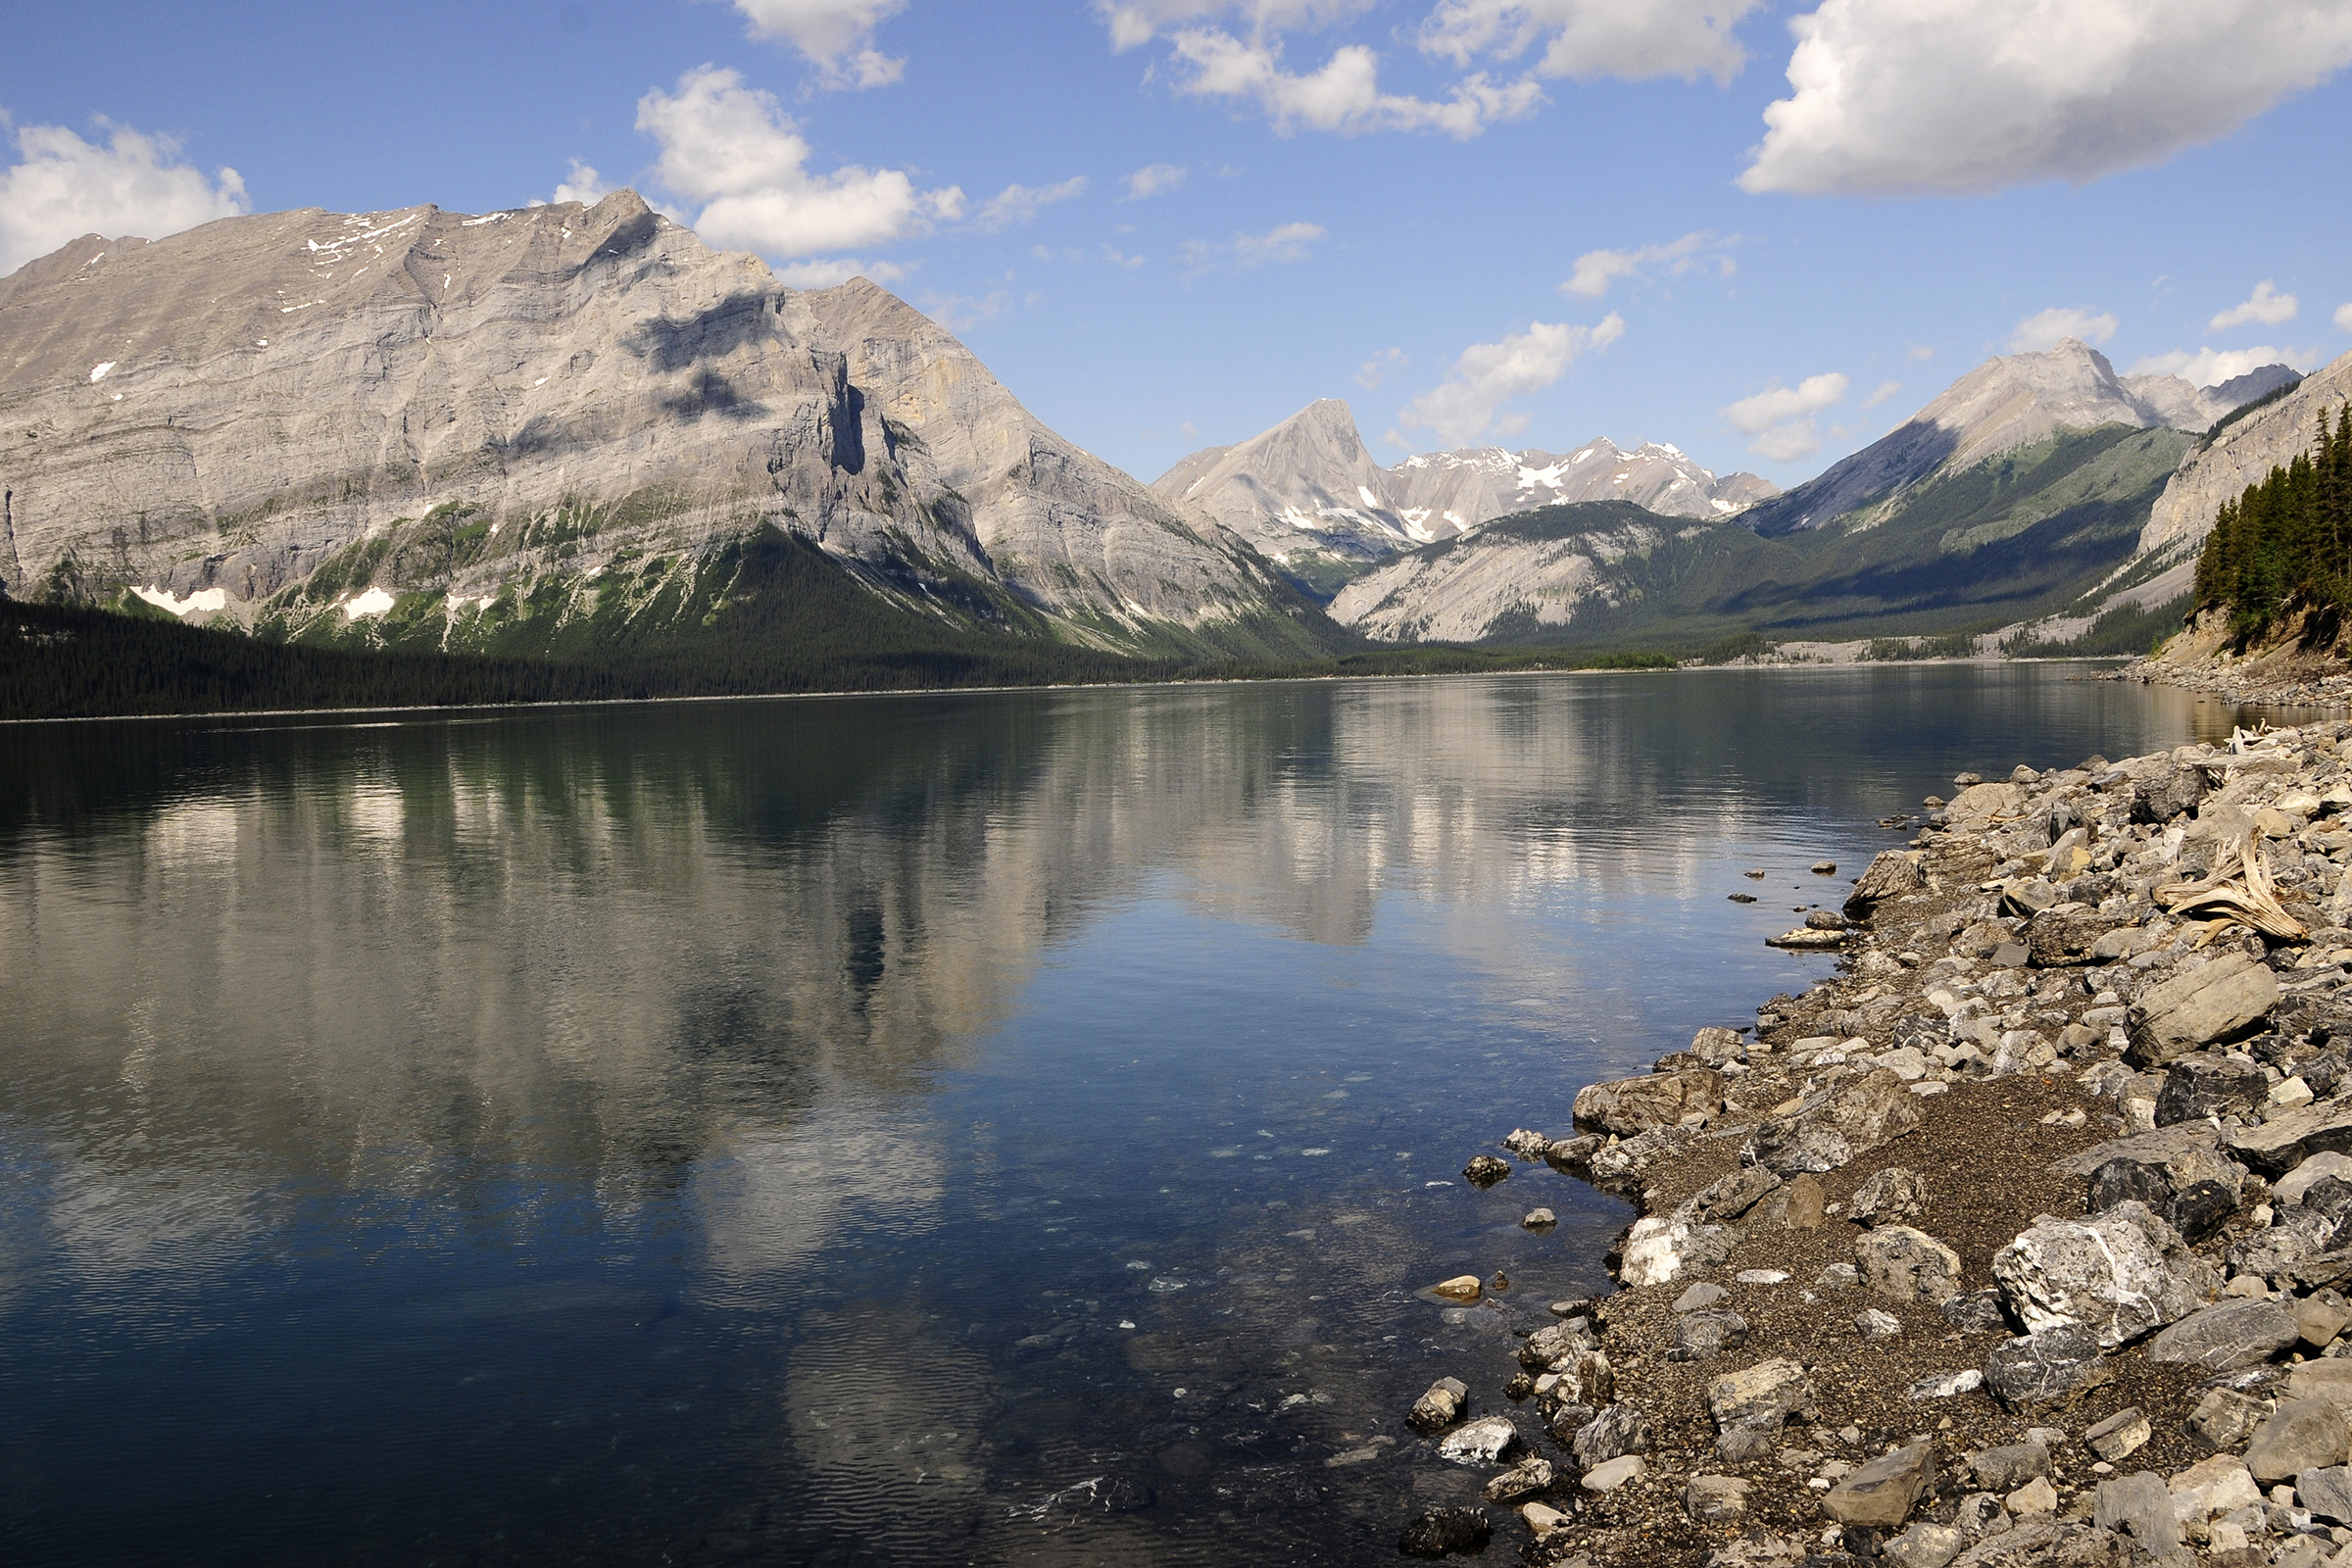 Kanada 2011 (Waterton és Kananaskis)